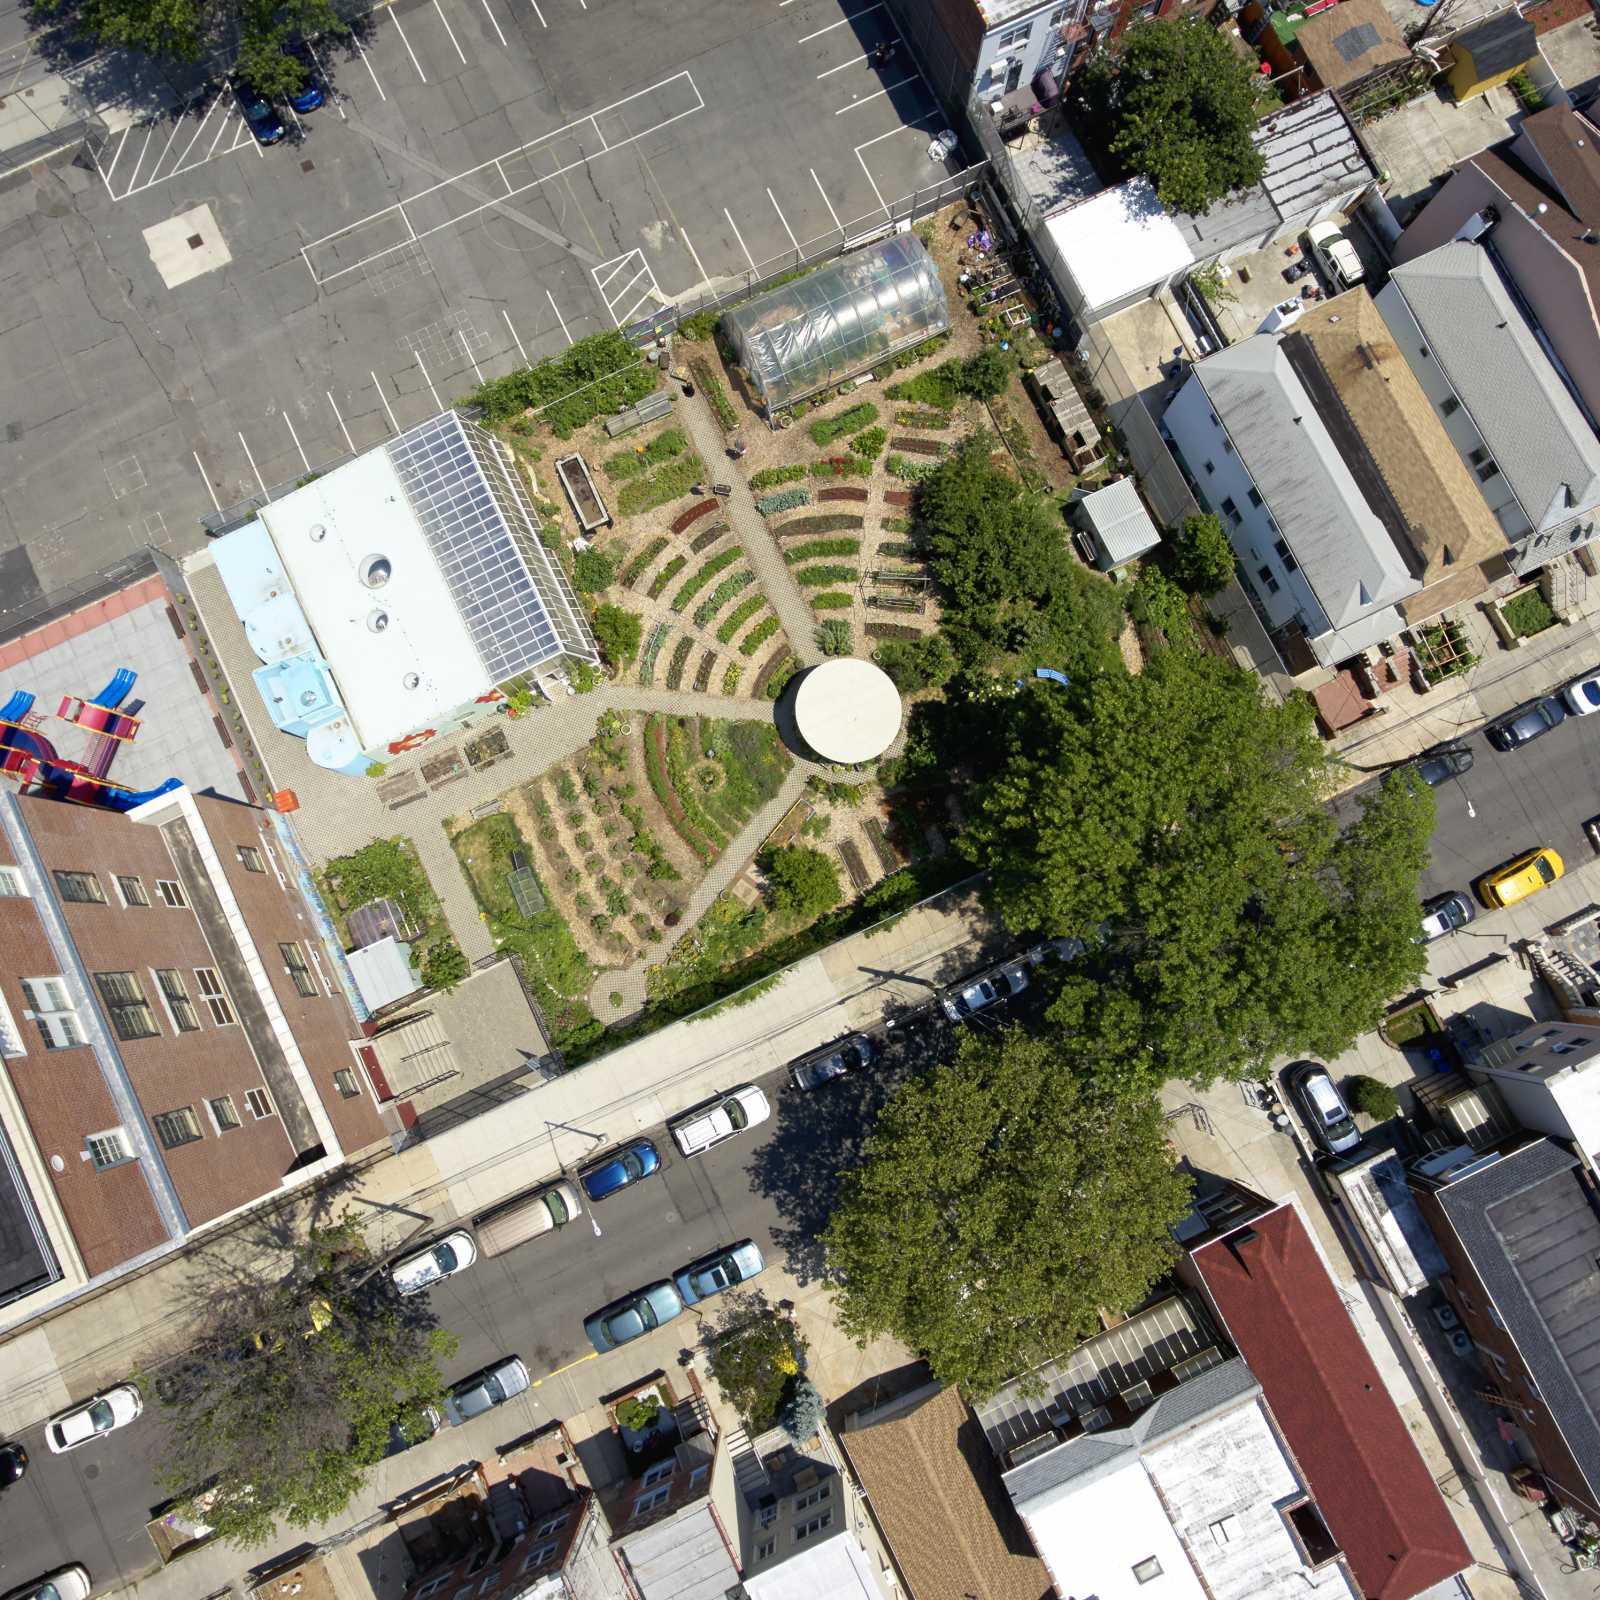 Edible Schoolyard NYC at P.S. 216